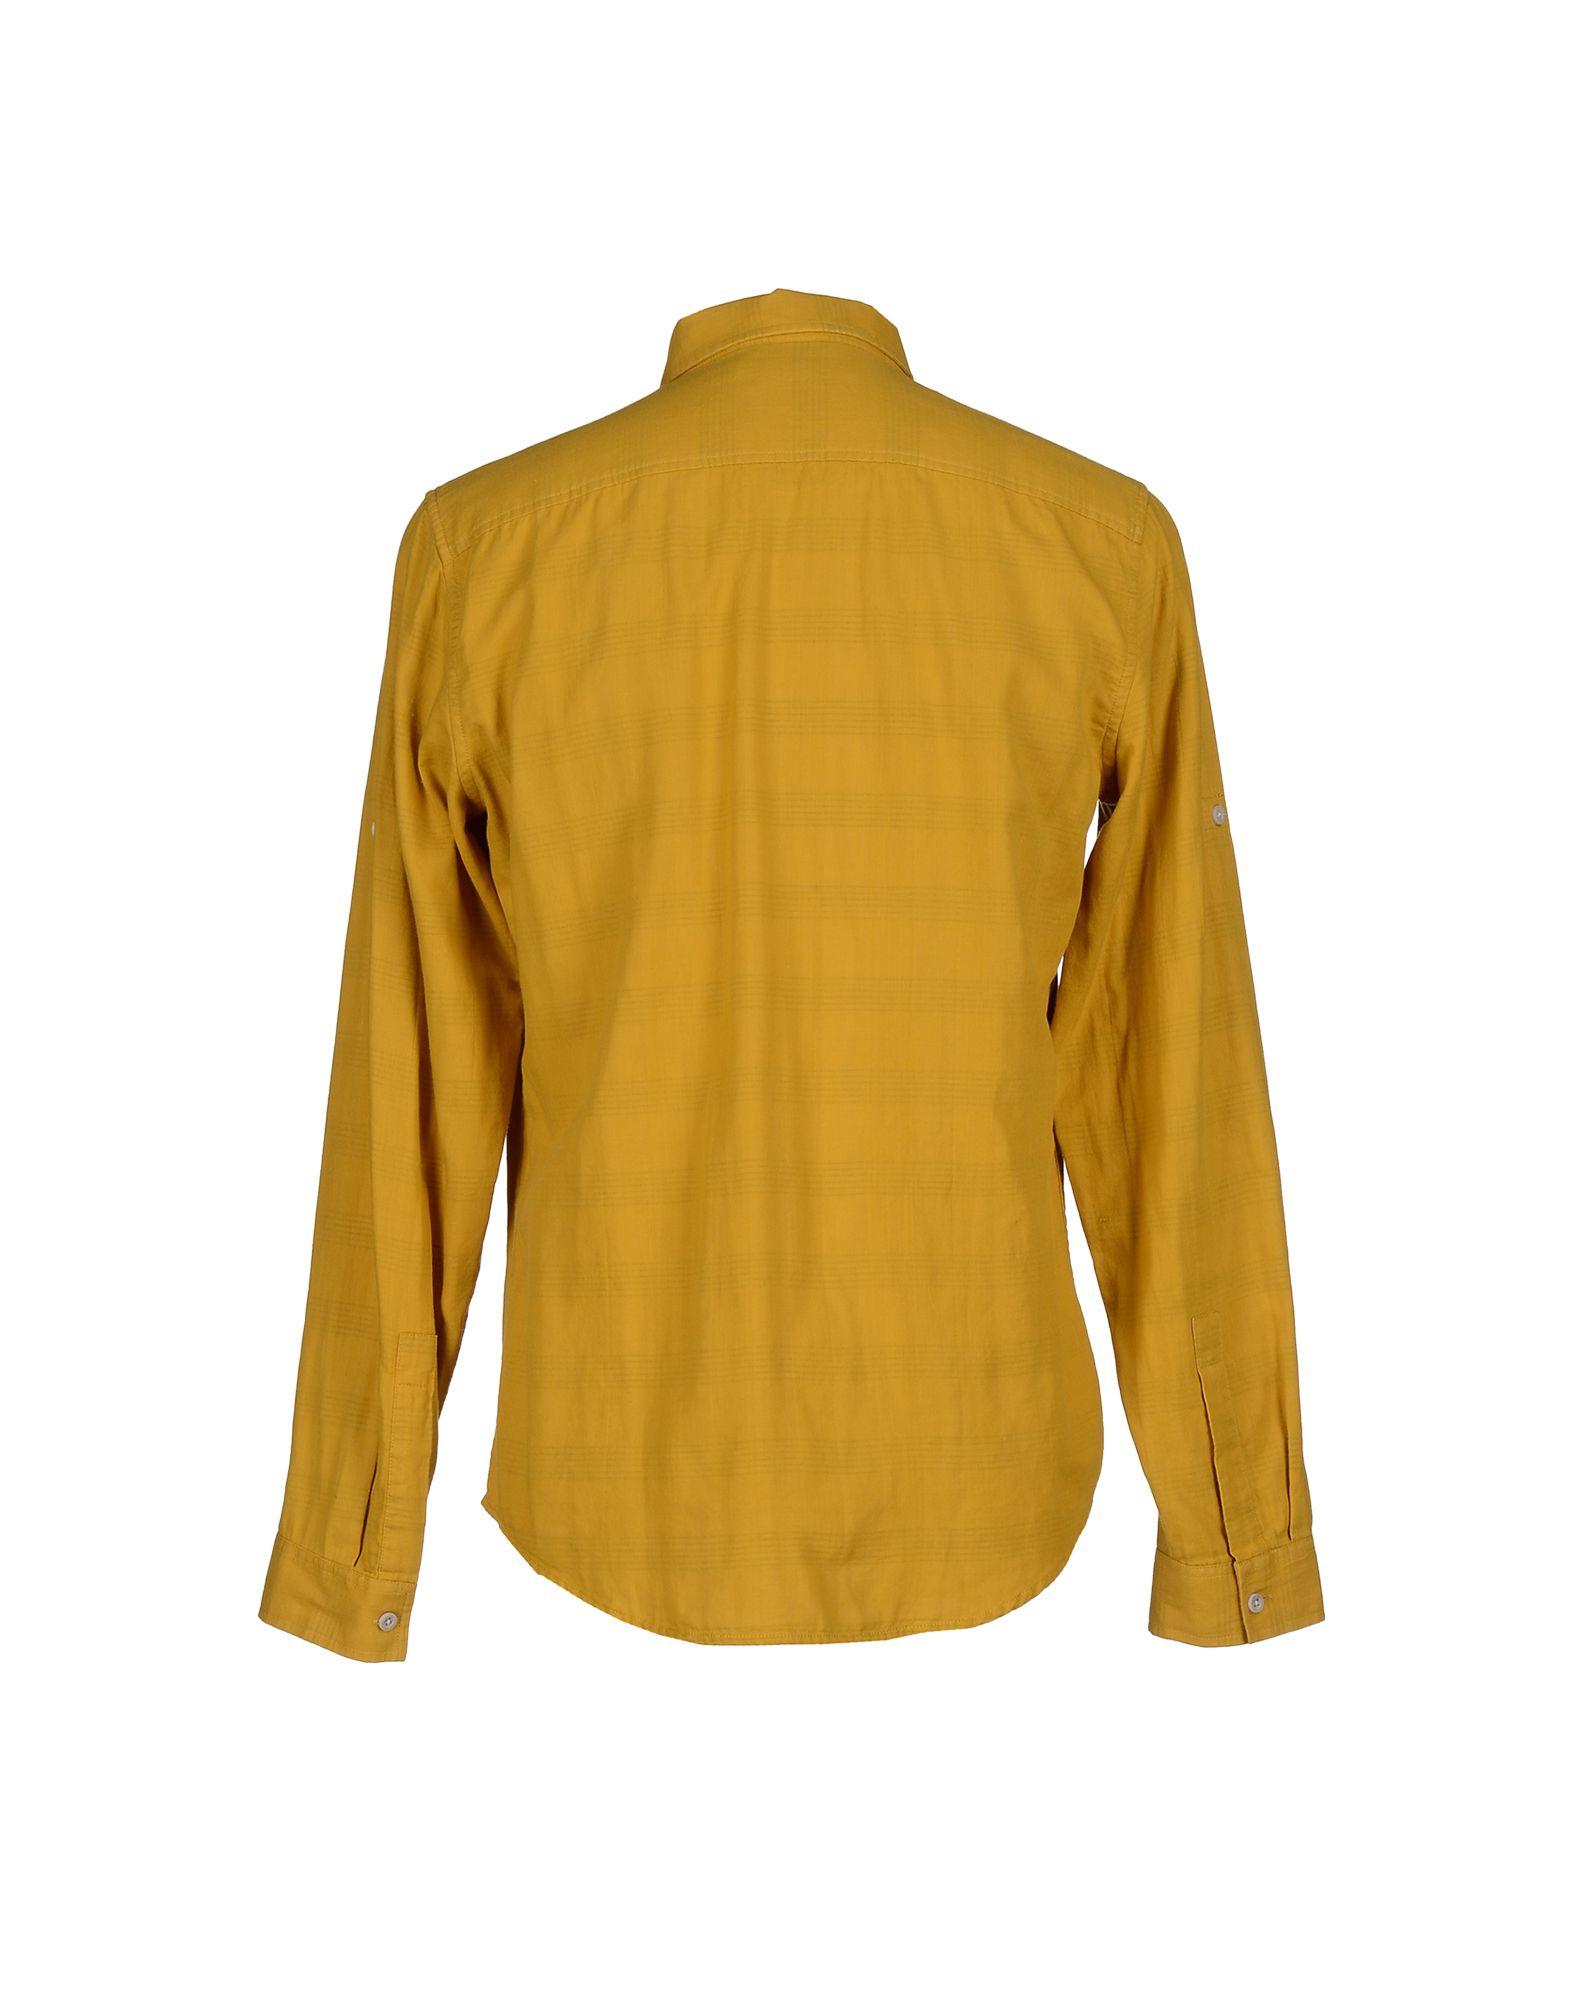 calvin klein jeans shirt in yellow for men ocher lyst. Black Bedroom Furniture Sets. Home Design Ideas